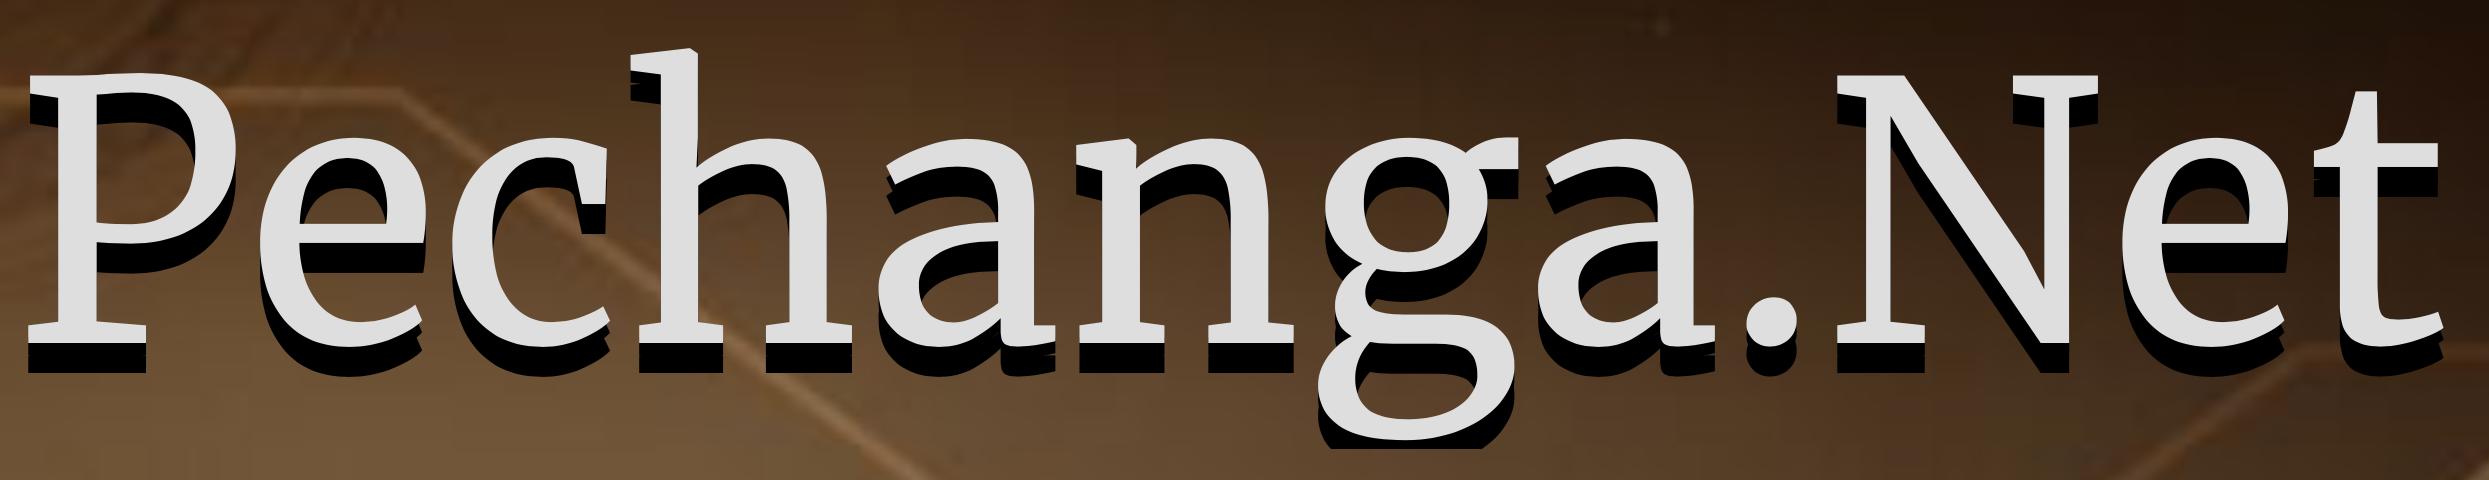 Pechange.net_Logo